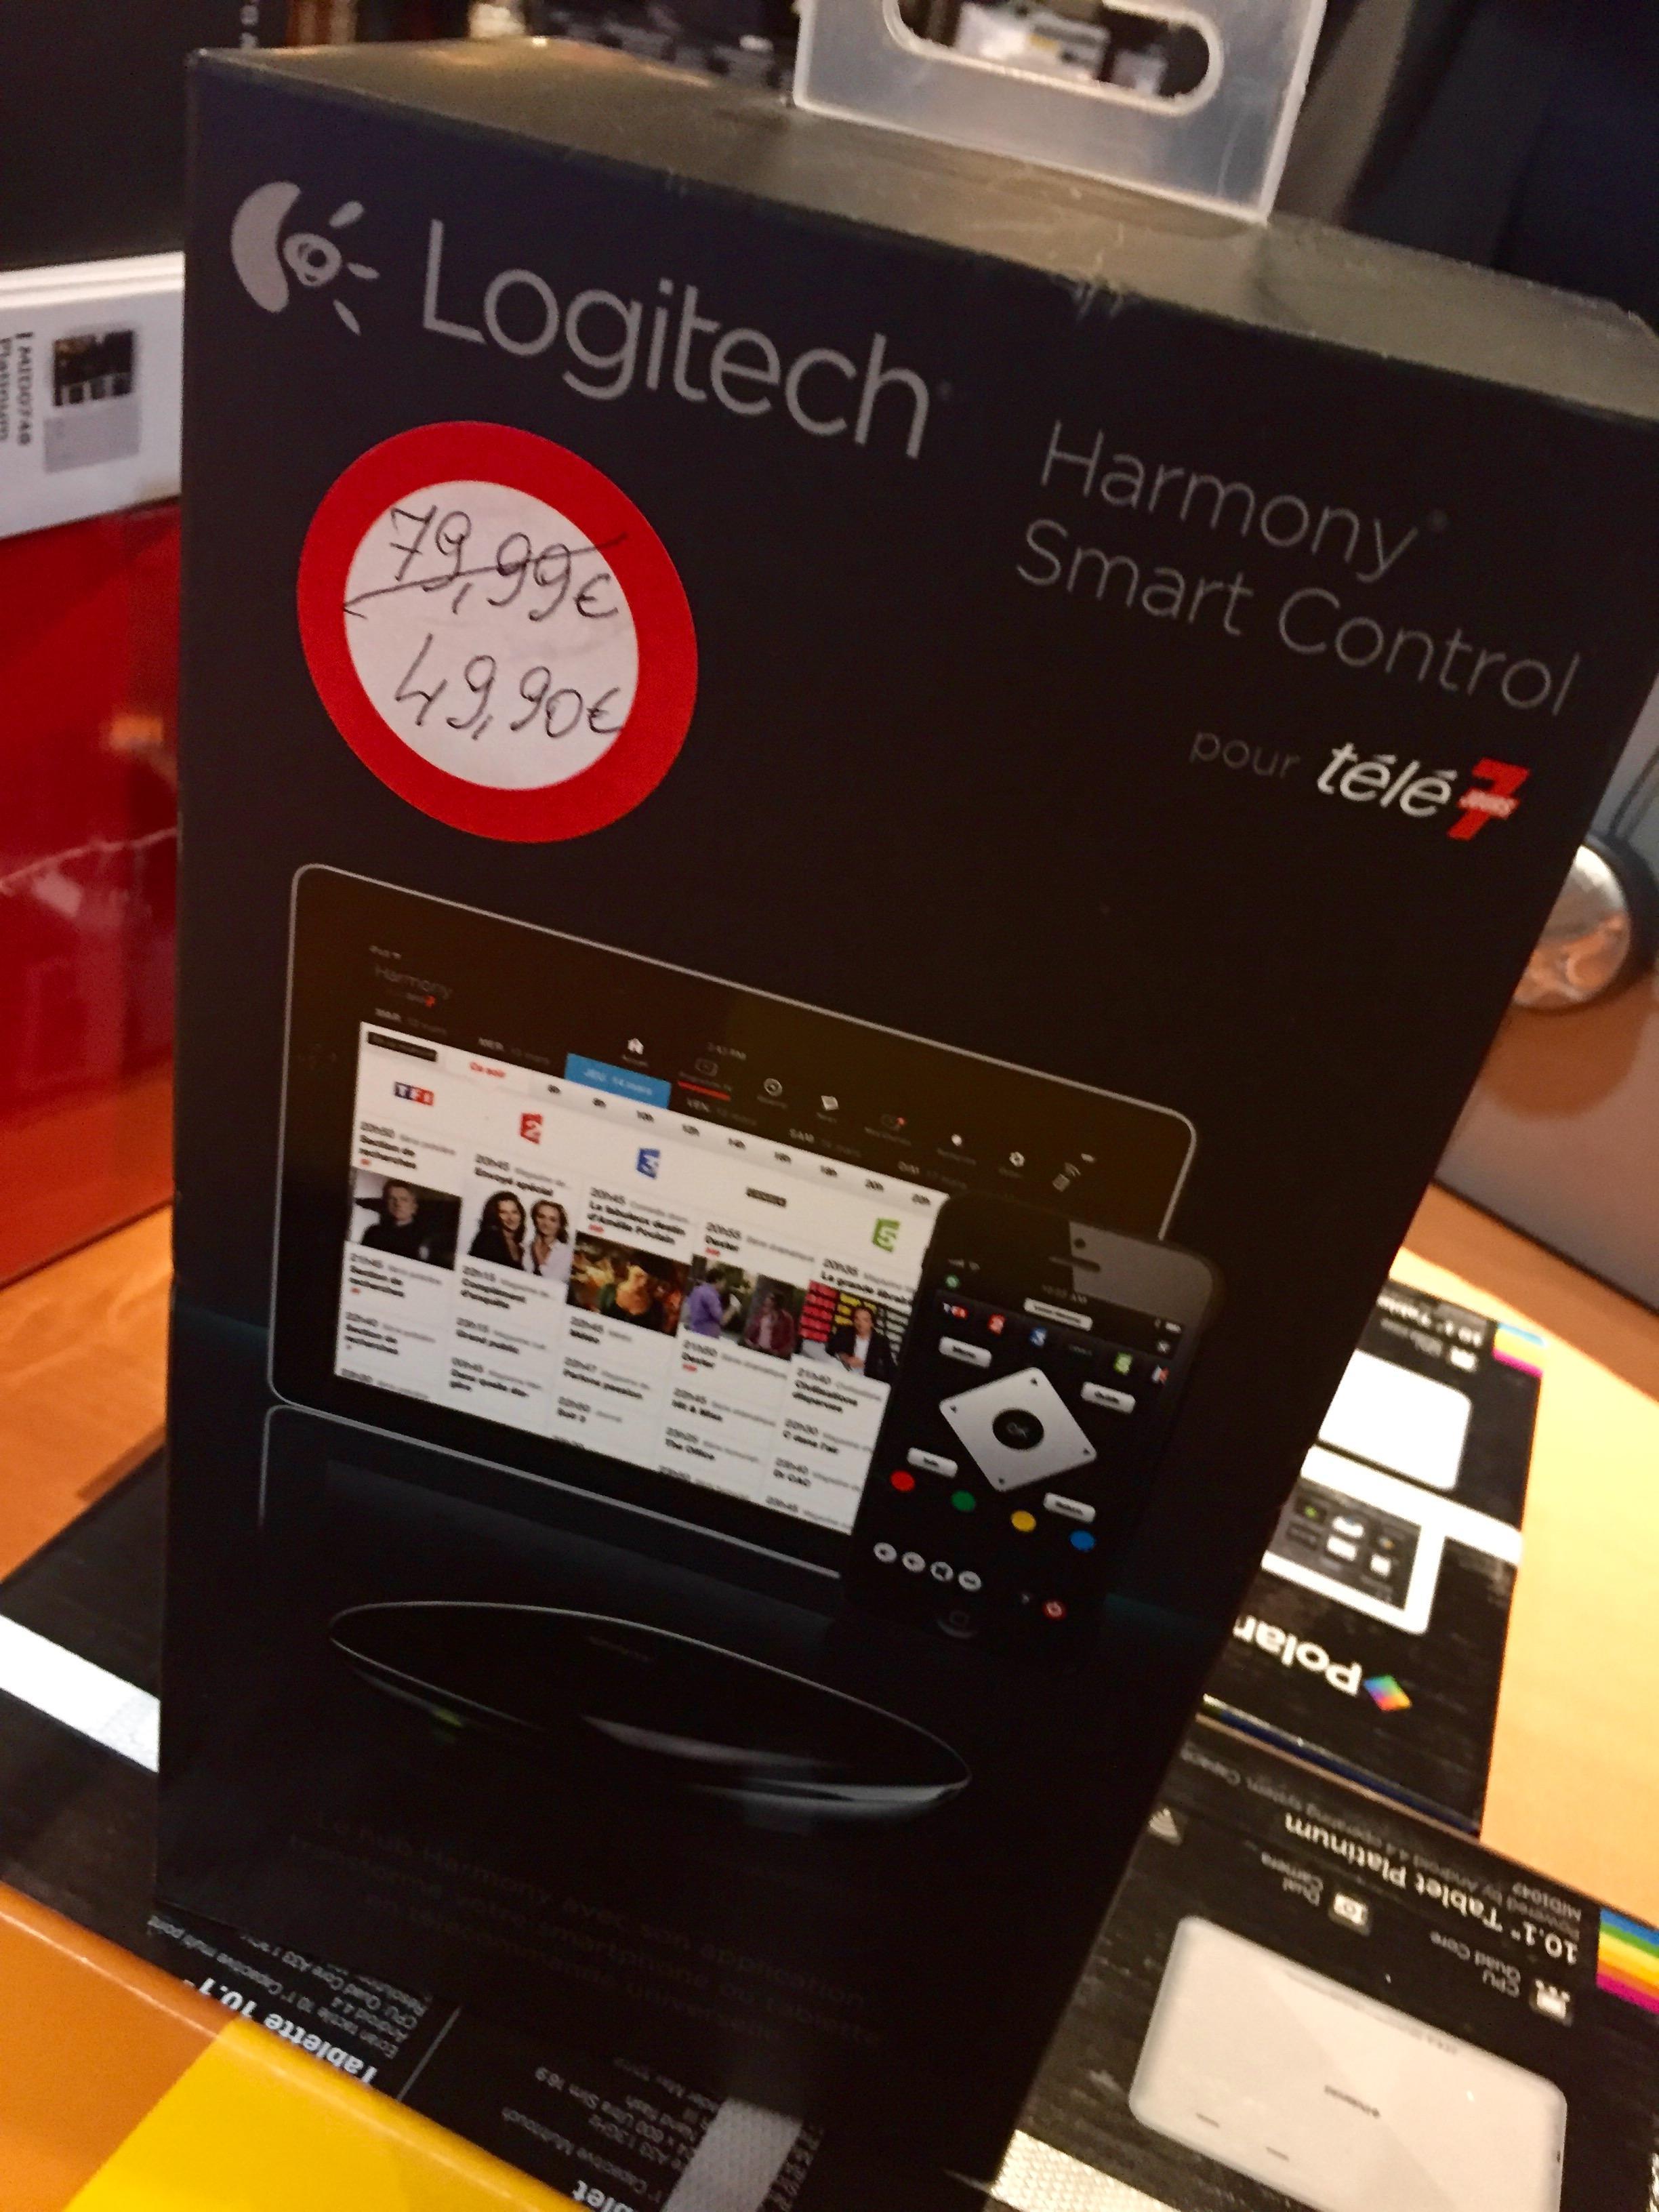 Harmony Smart Control avec télécommande et hub